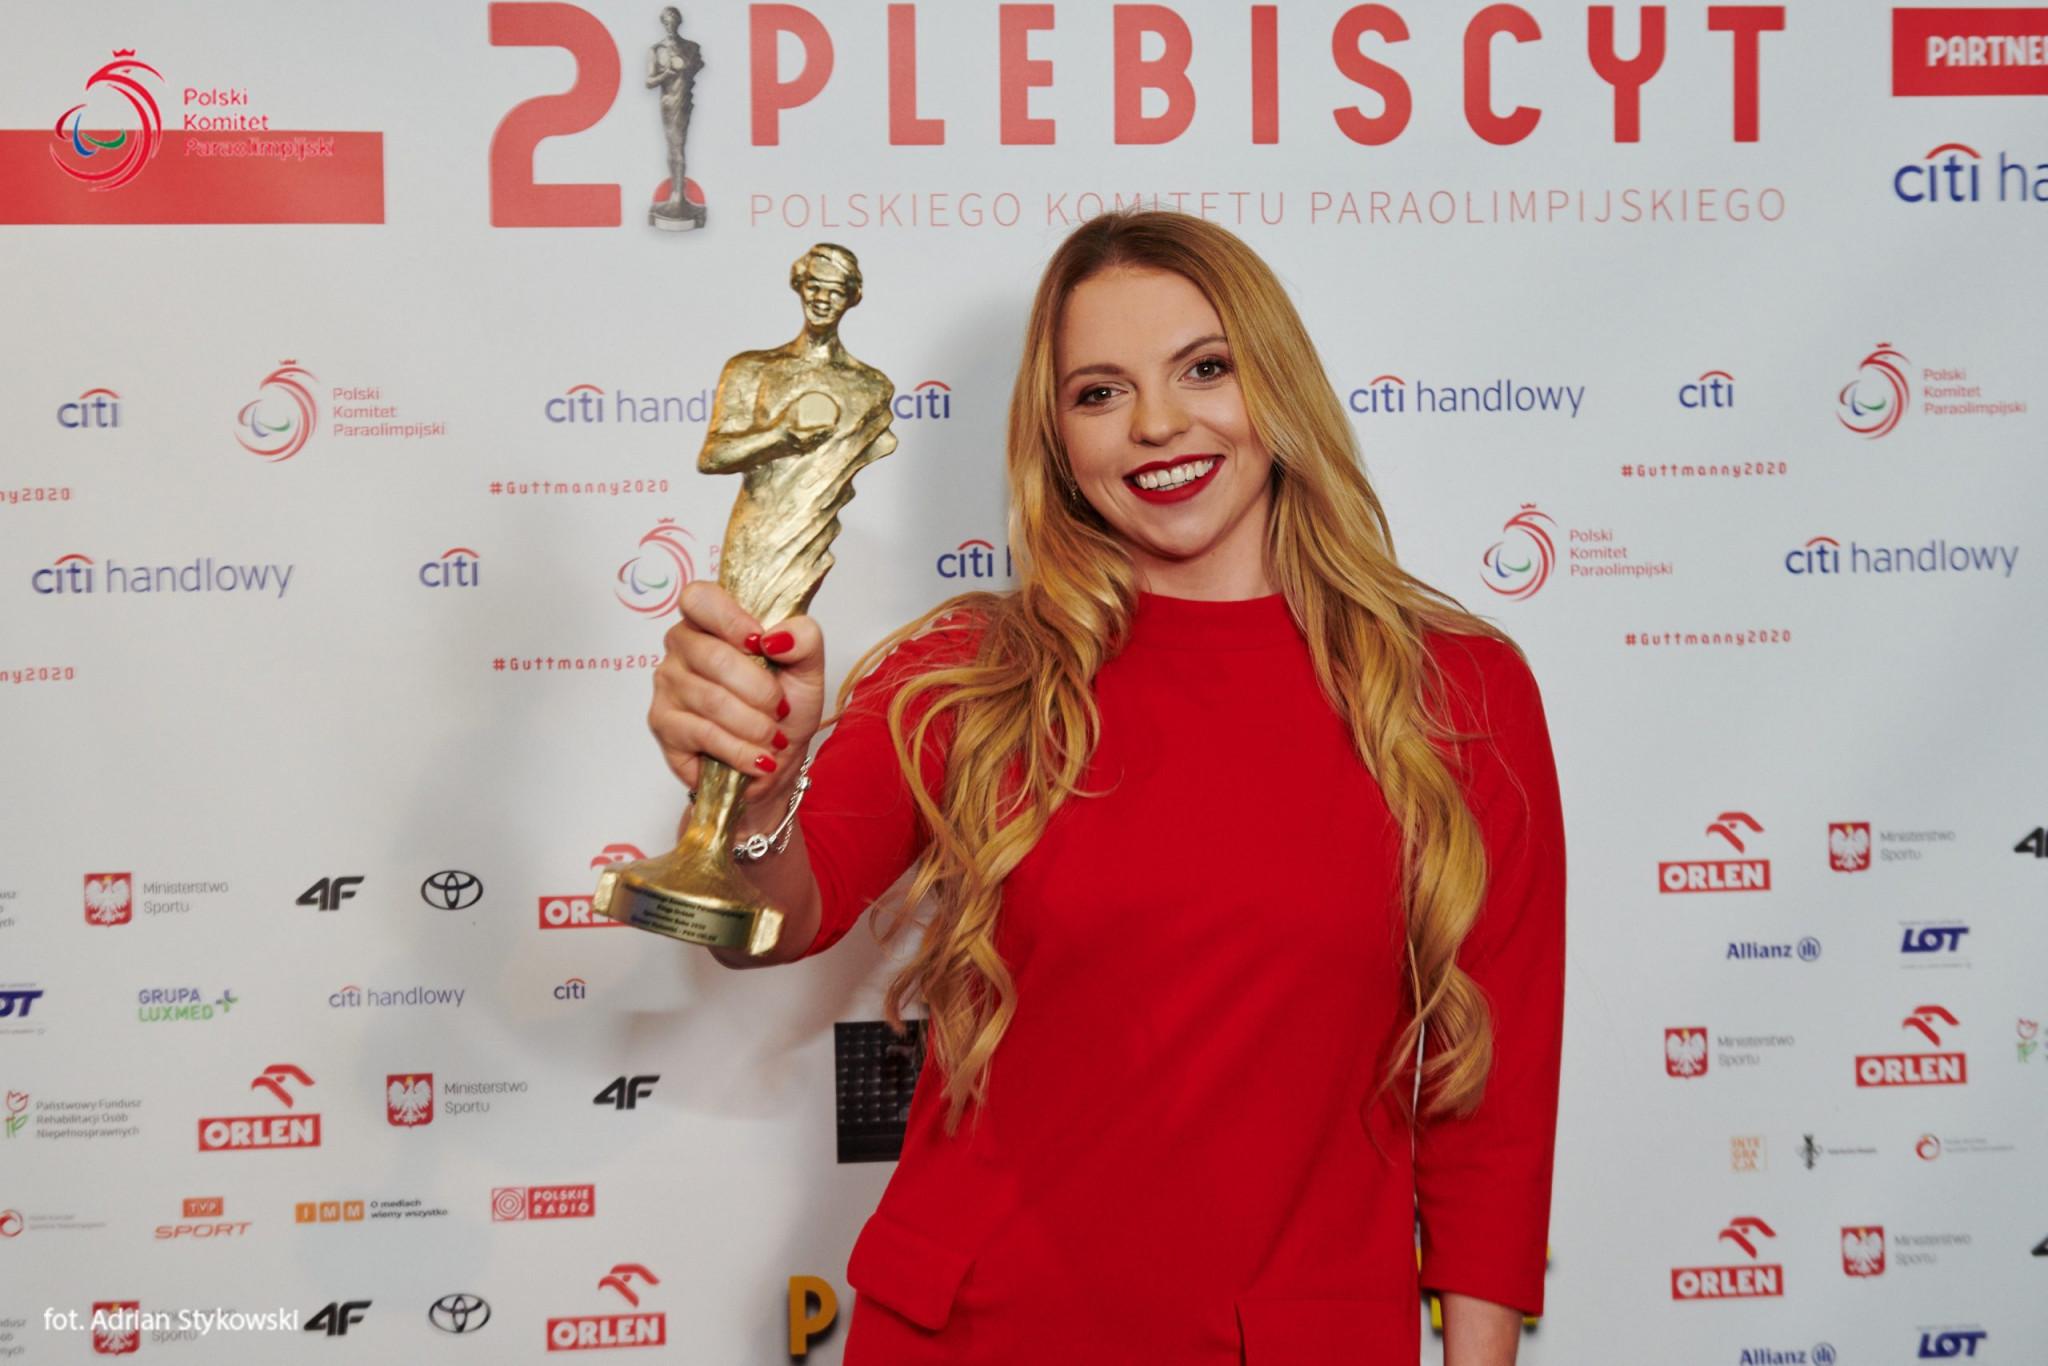 Kinga Dróżdż is the Polish Paralympic Athlete of the Year ©PPC